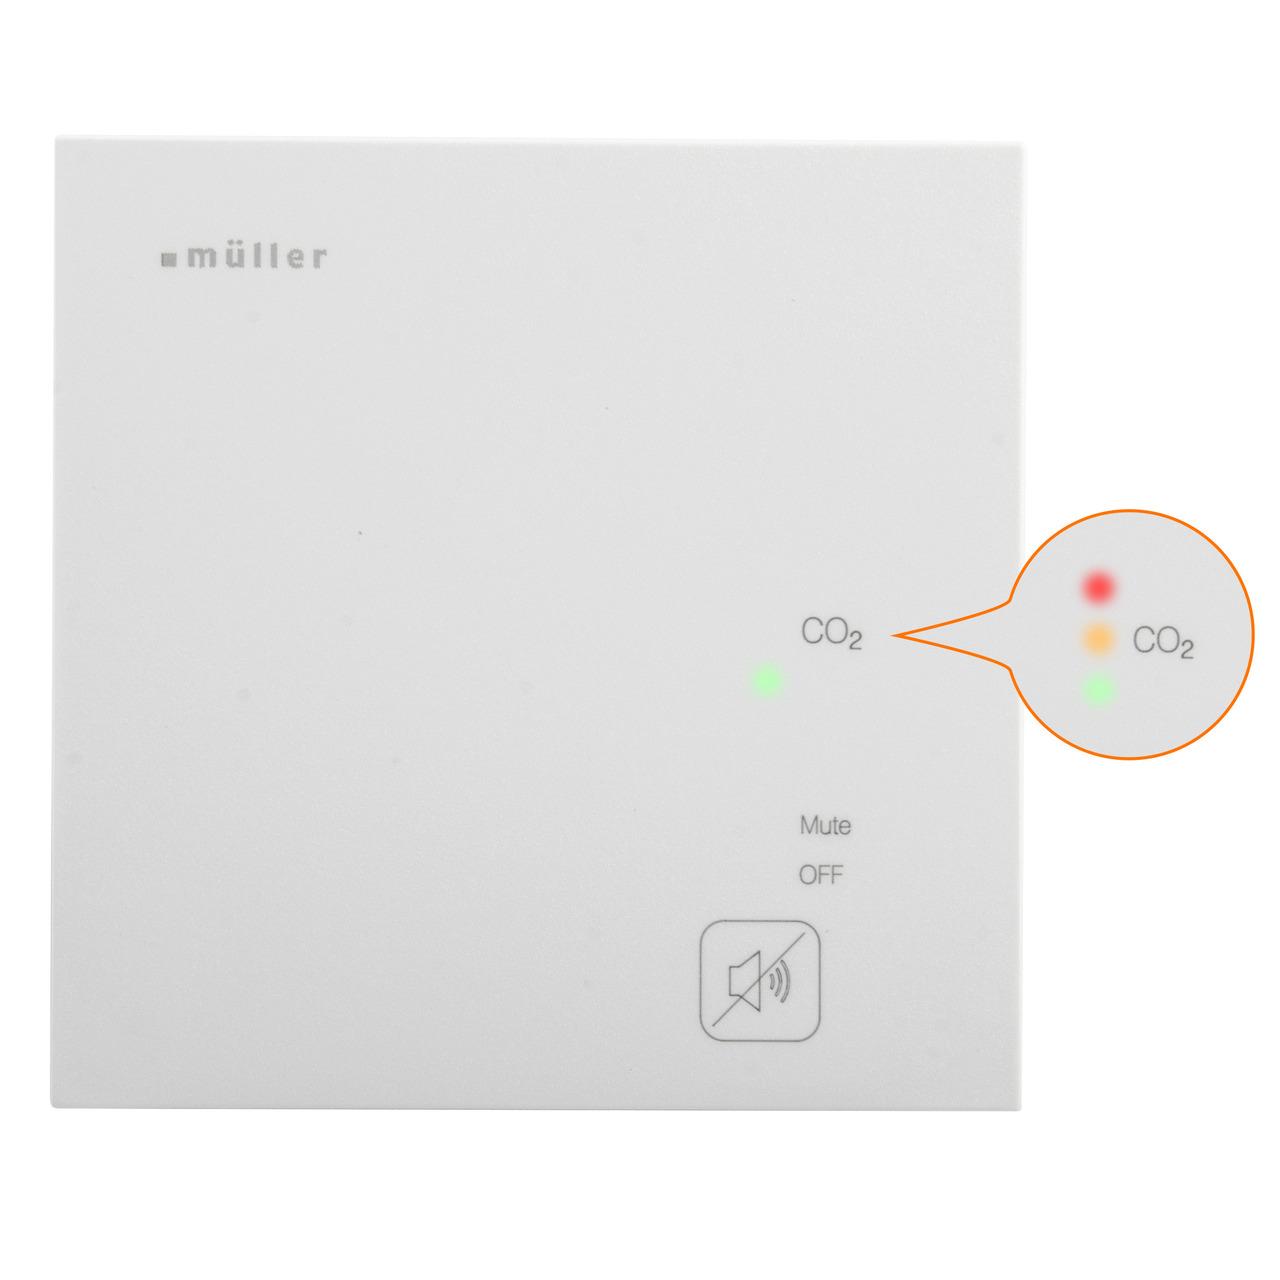 Hugo Müller Luftgütesensor-CO2-Ampel GS 42-01 pro mit 3 Open-Collector-Ausgängen